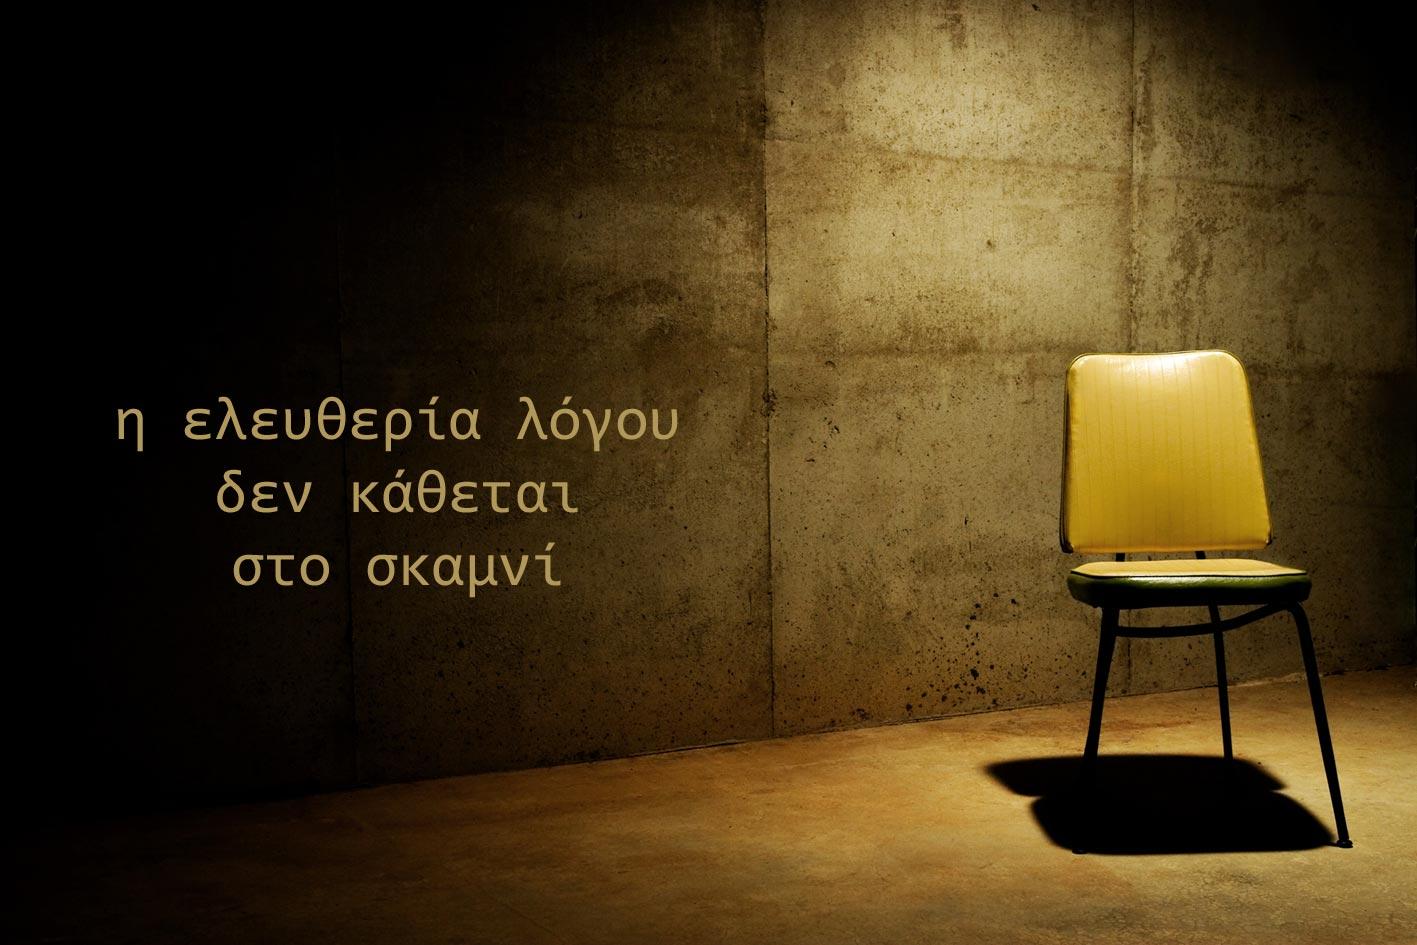 http://i2.wp.com/1.bp.blogspot.com/-STaE7nF1D8o/Uahcu-gcpRI/AAAAAAAAsfk/u6VwA7San3k/s1600/speechfreedom12.jpg?resize=559%2C373